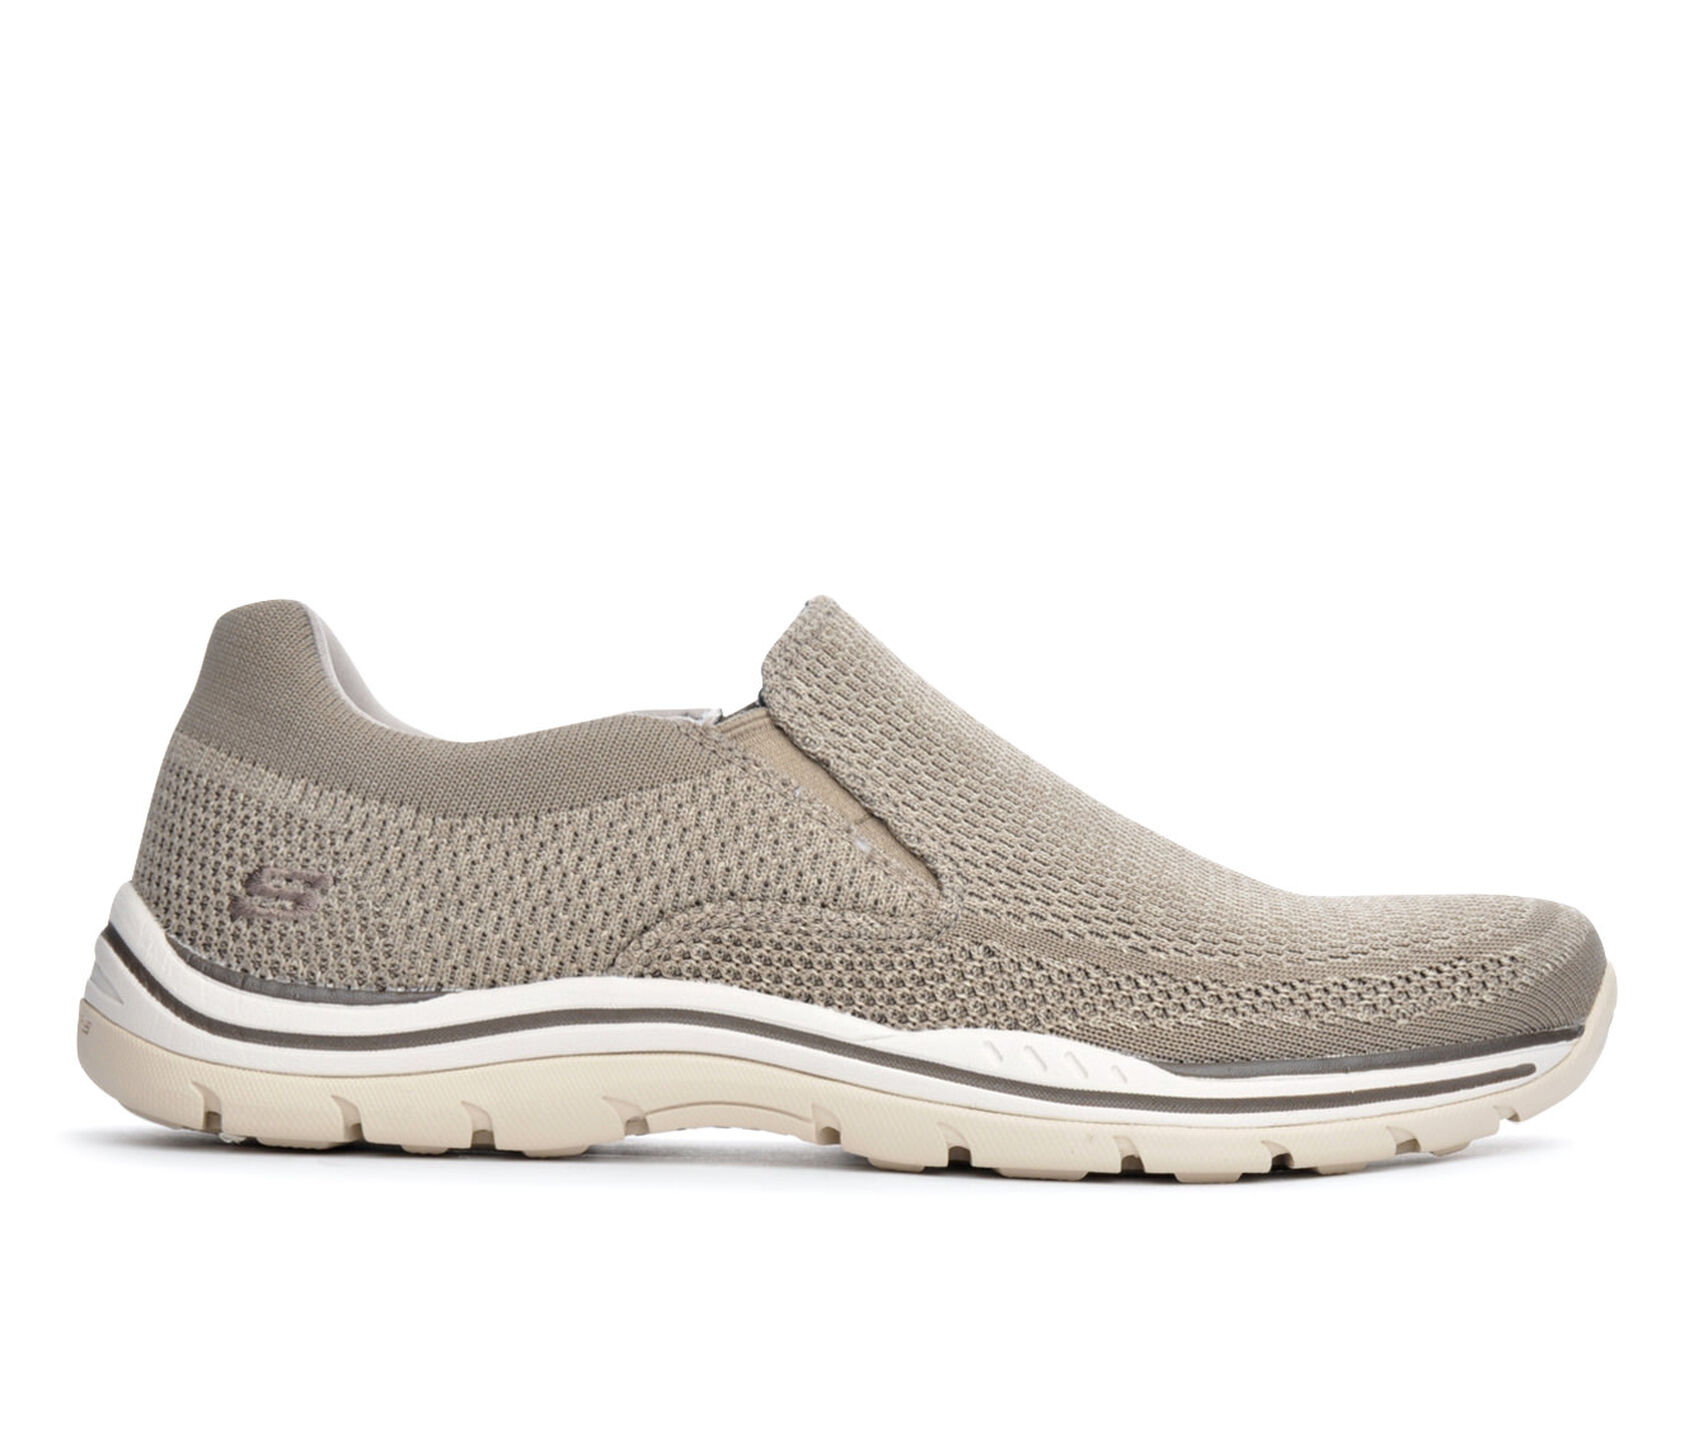 39aa9bc5d38 Men's Skechers Gomel 65086 Casual Shoes | Shoe Carnival